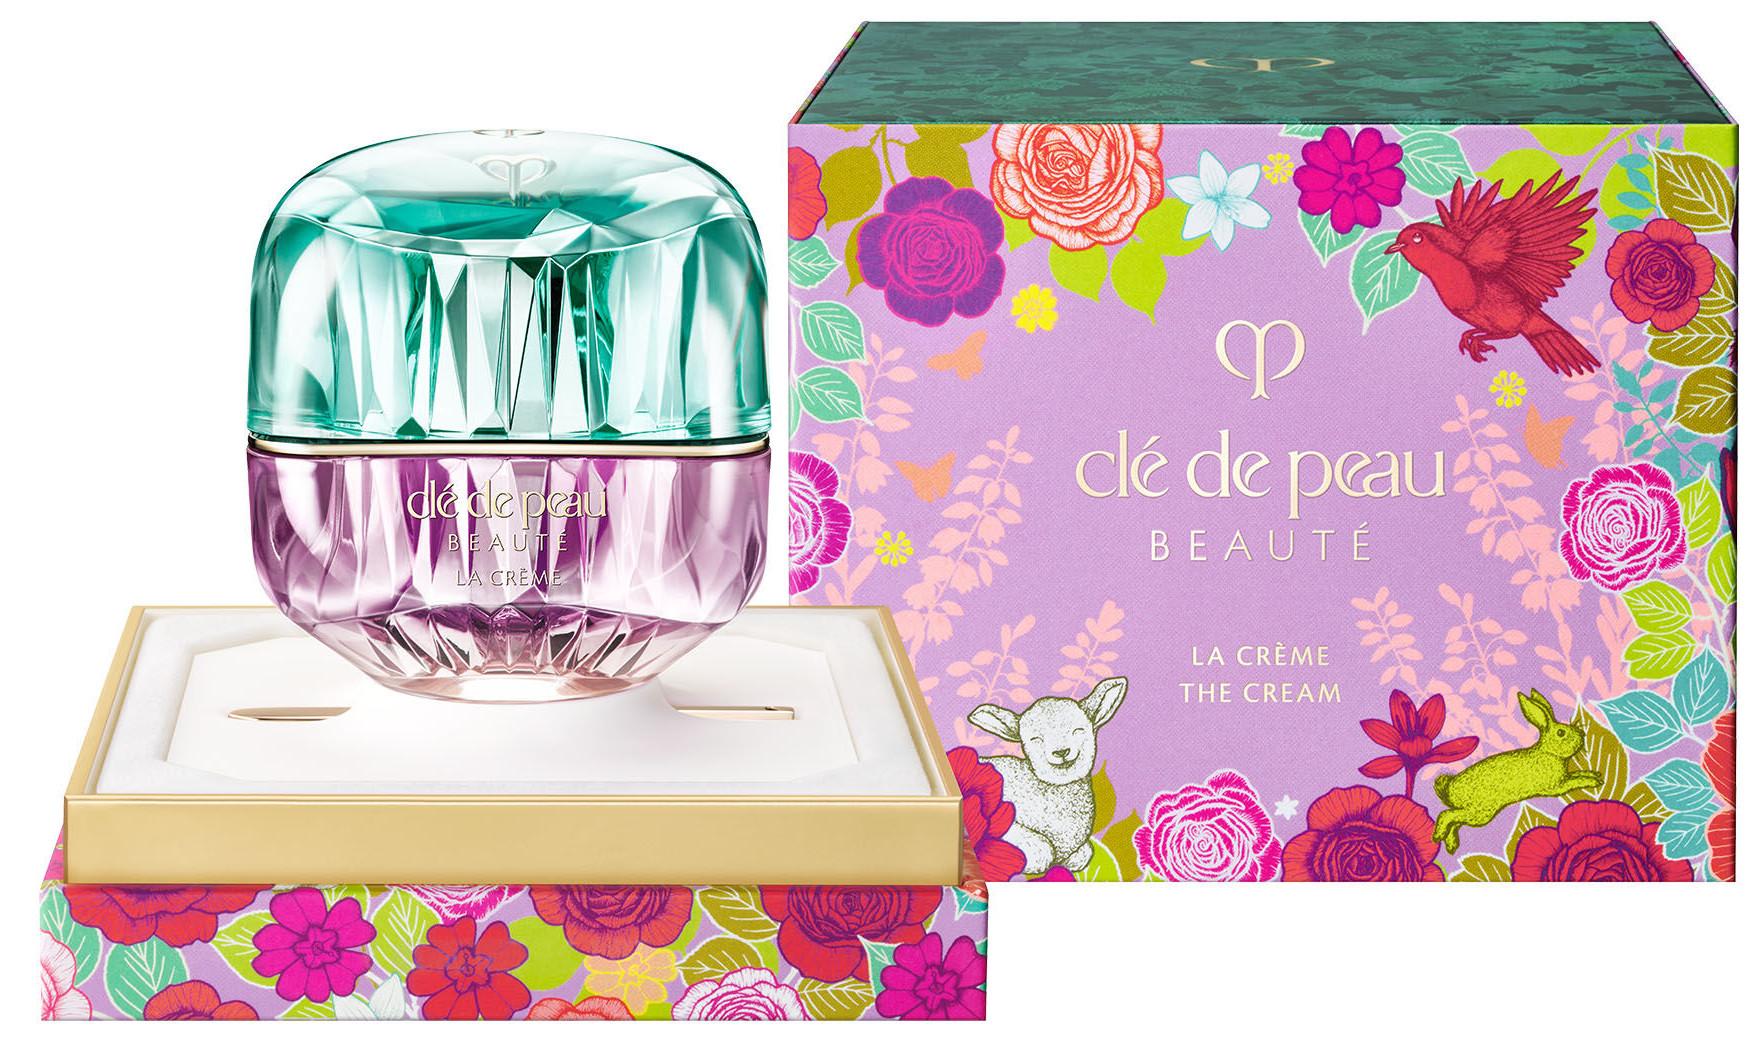 Cle de Peau Beauty Garden Of Splendor The Cream